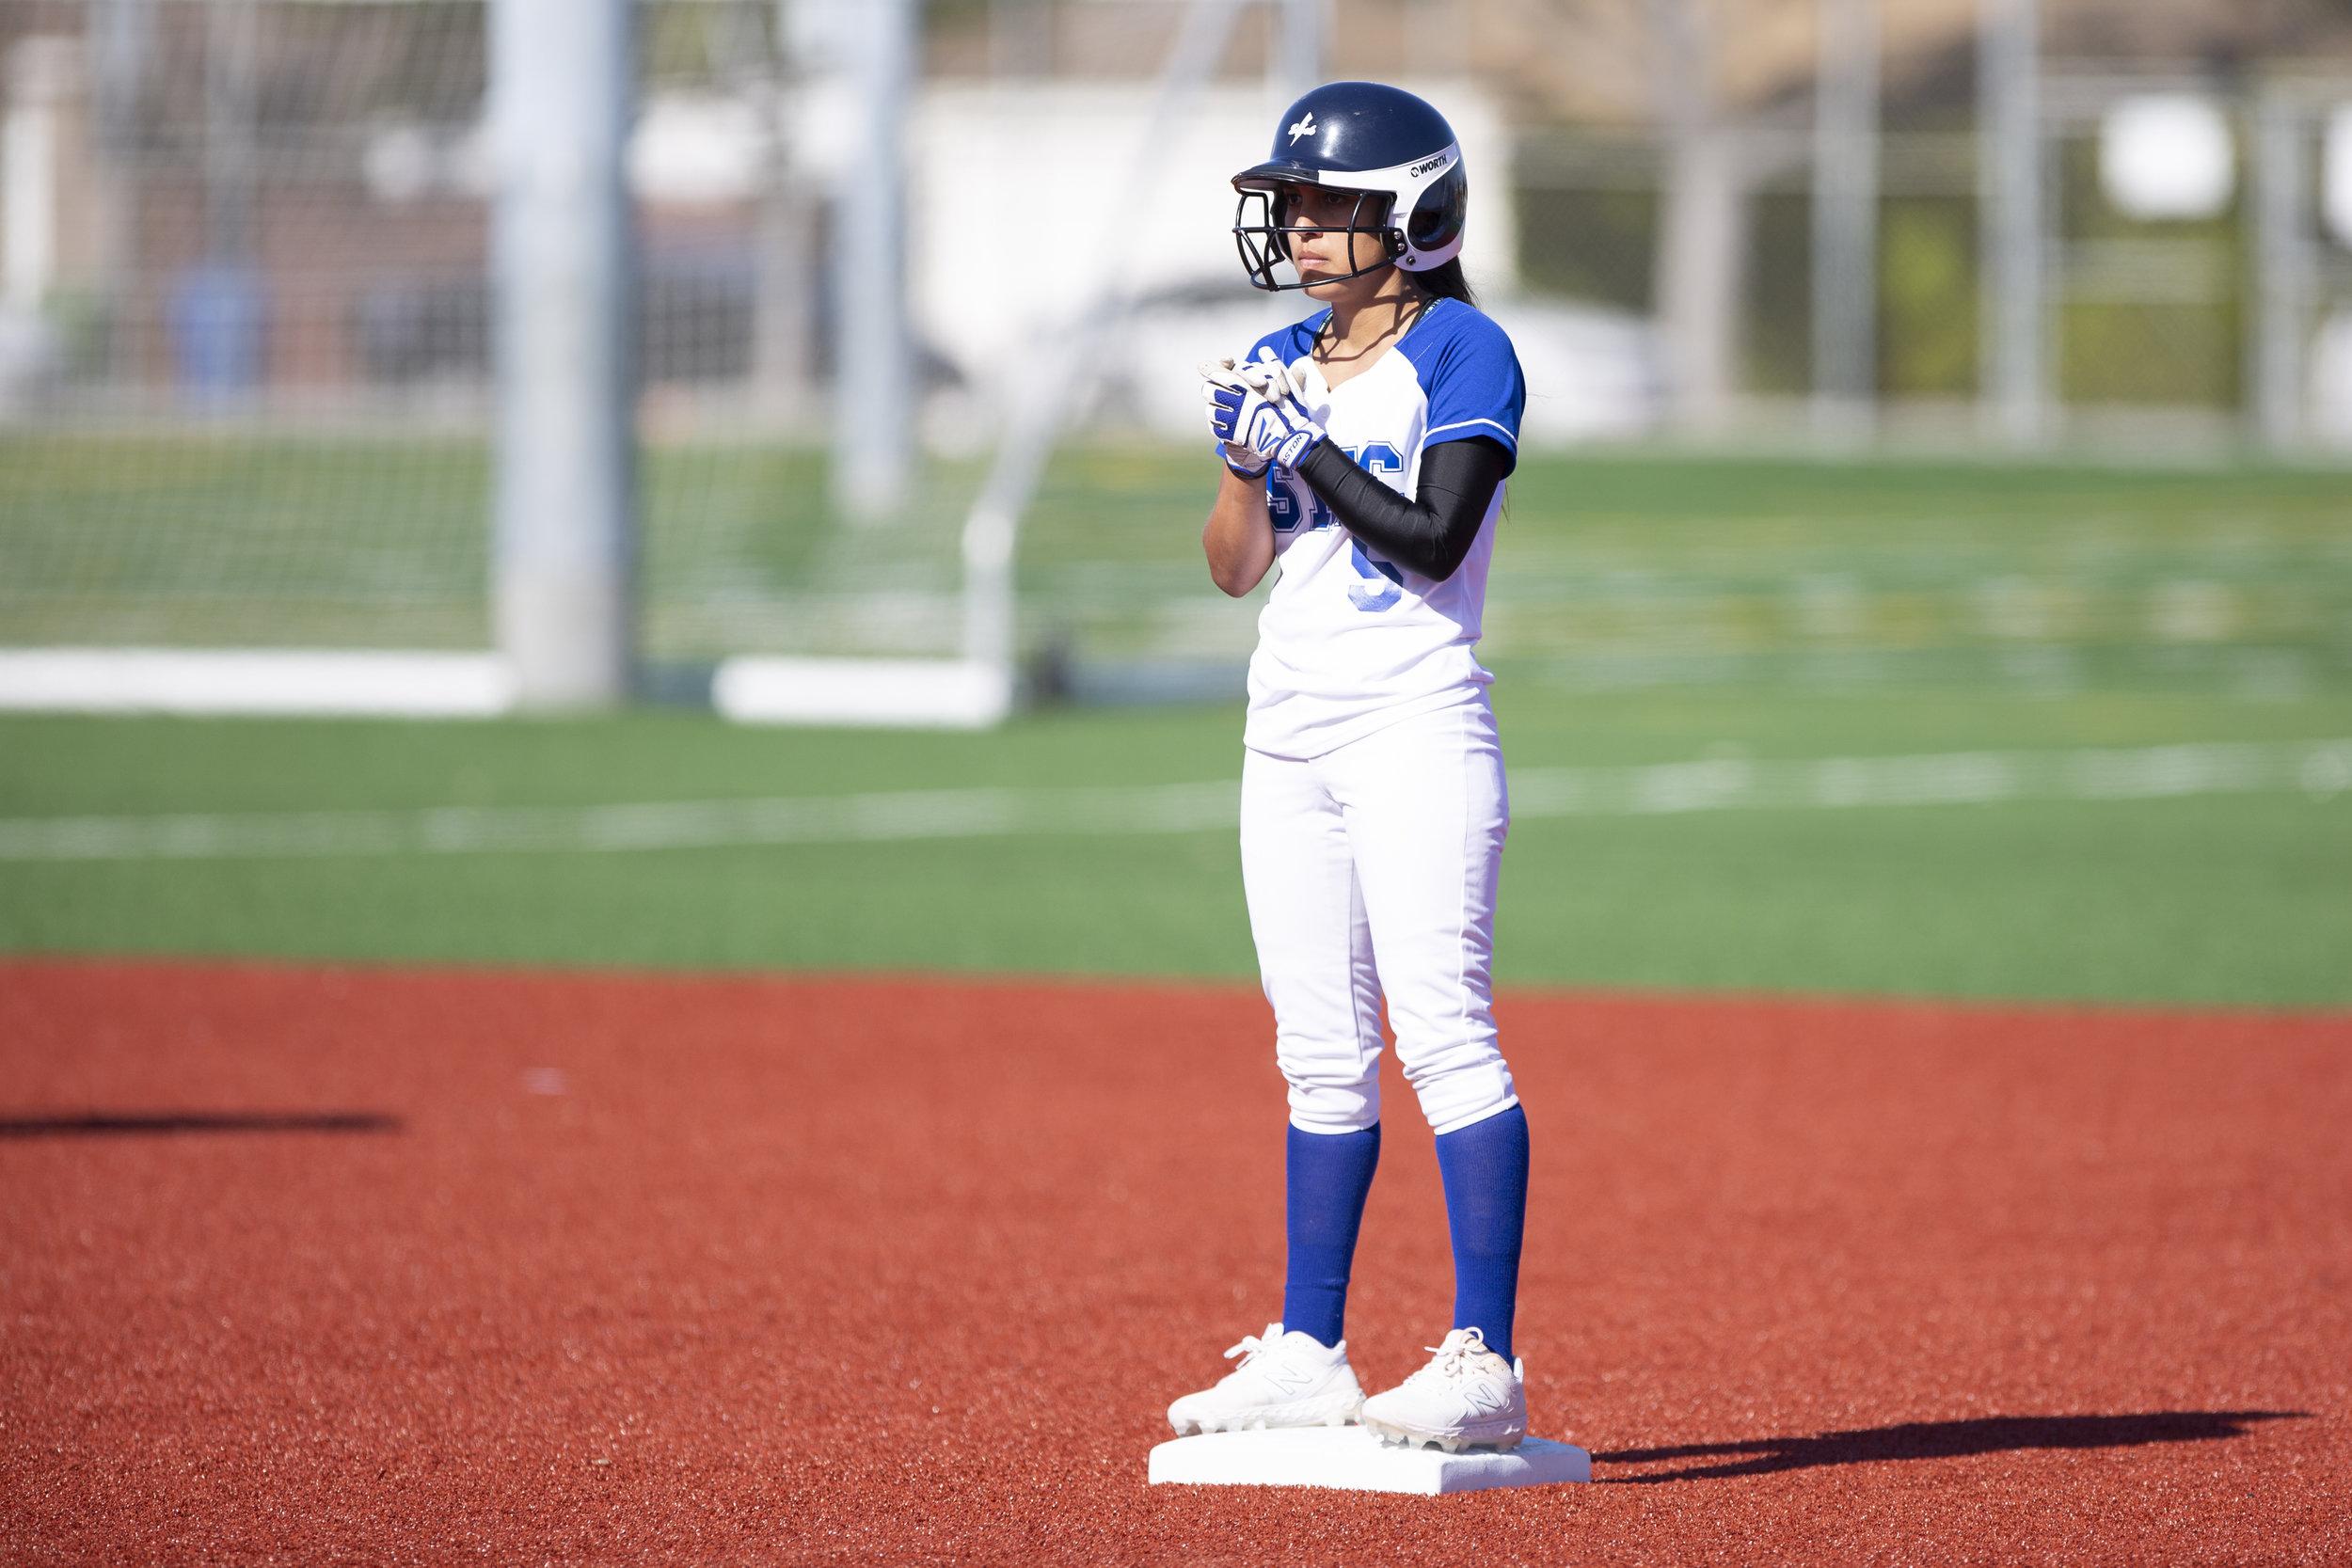 Emma Soto, from Santa Monica College softball team playing at home vs Moorpark team, Thursday, March 7, 2019 in Santa Monica, Calif. ( Yasmin Jafari / The Corsair)